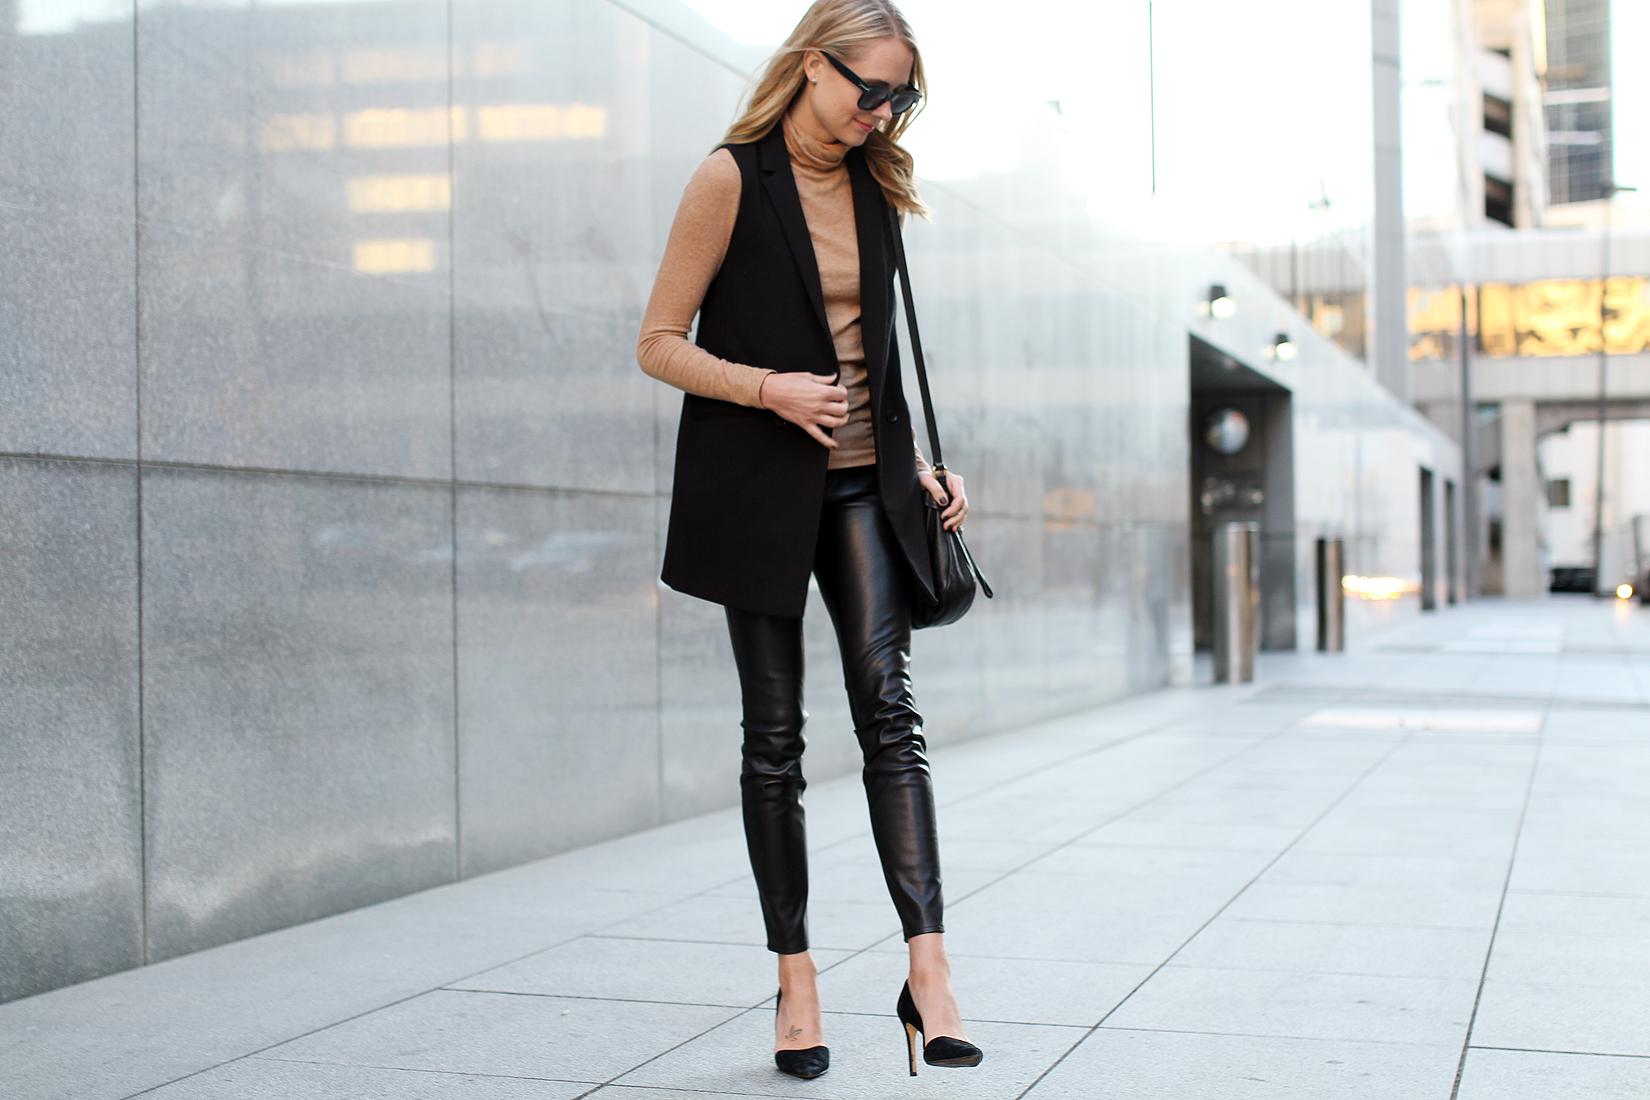 fashion-jackson-camel-turtleneck-black-long-vest-black-faux-leather-skinny-pants-black-suede-pumps